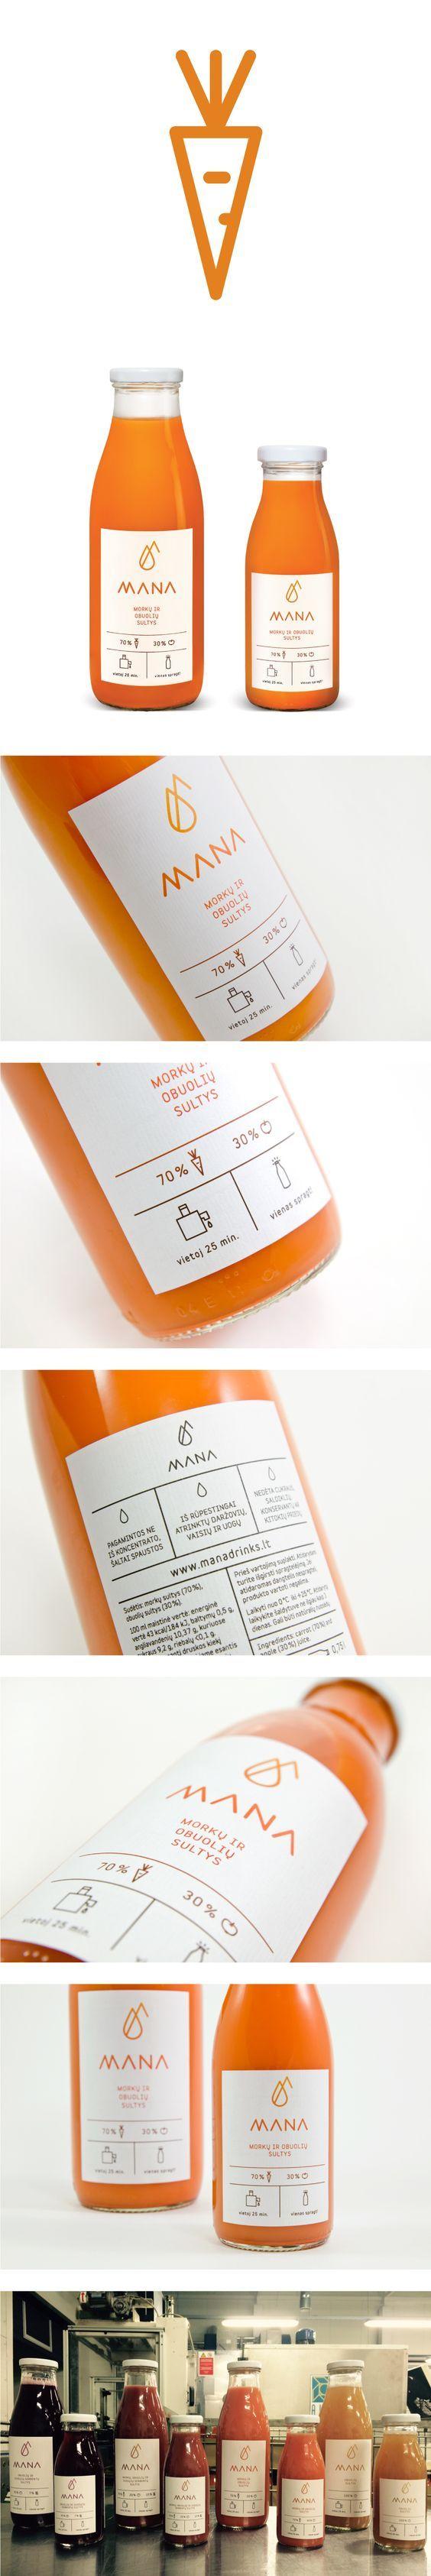 MANA – premium category cold-pressed juice. Designed by PRIM PRIM studio / www.primprim.lt. Designers: Miglė Vasiliauskaitė, Kotryna Zilinskienė, Kristina Liaudanskaitė. Lithuania.: